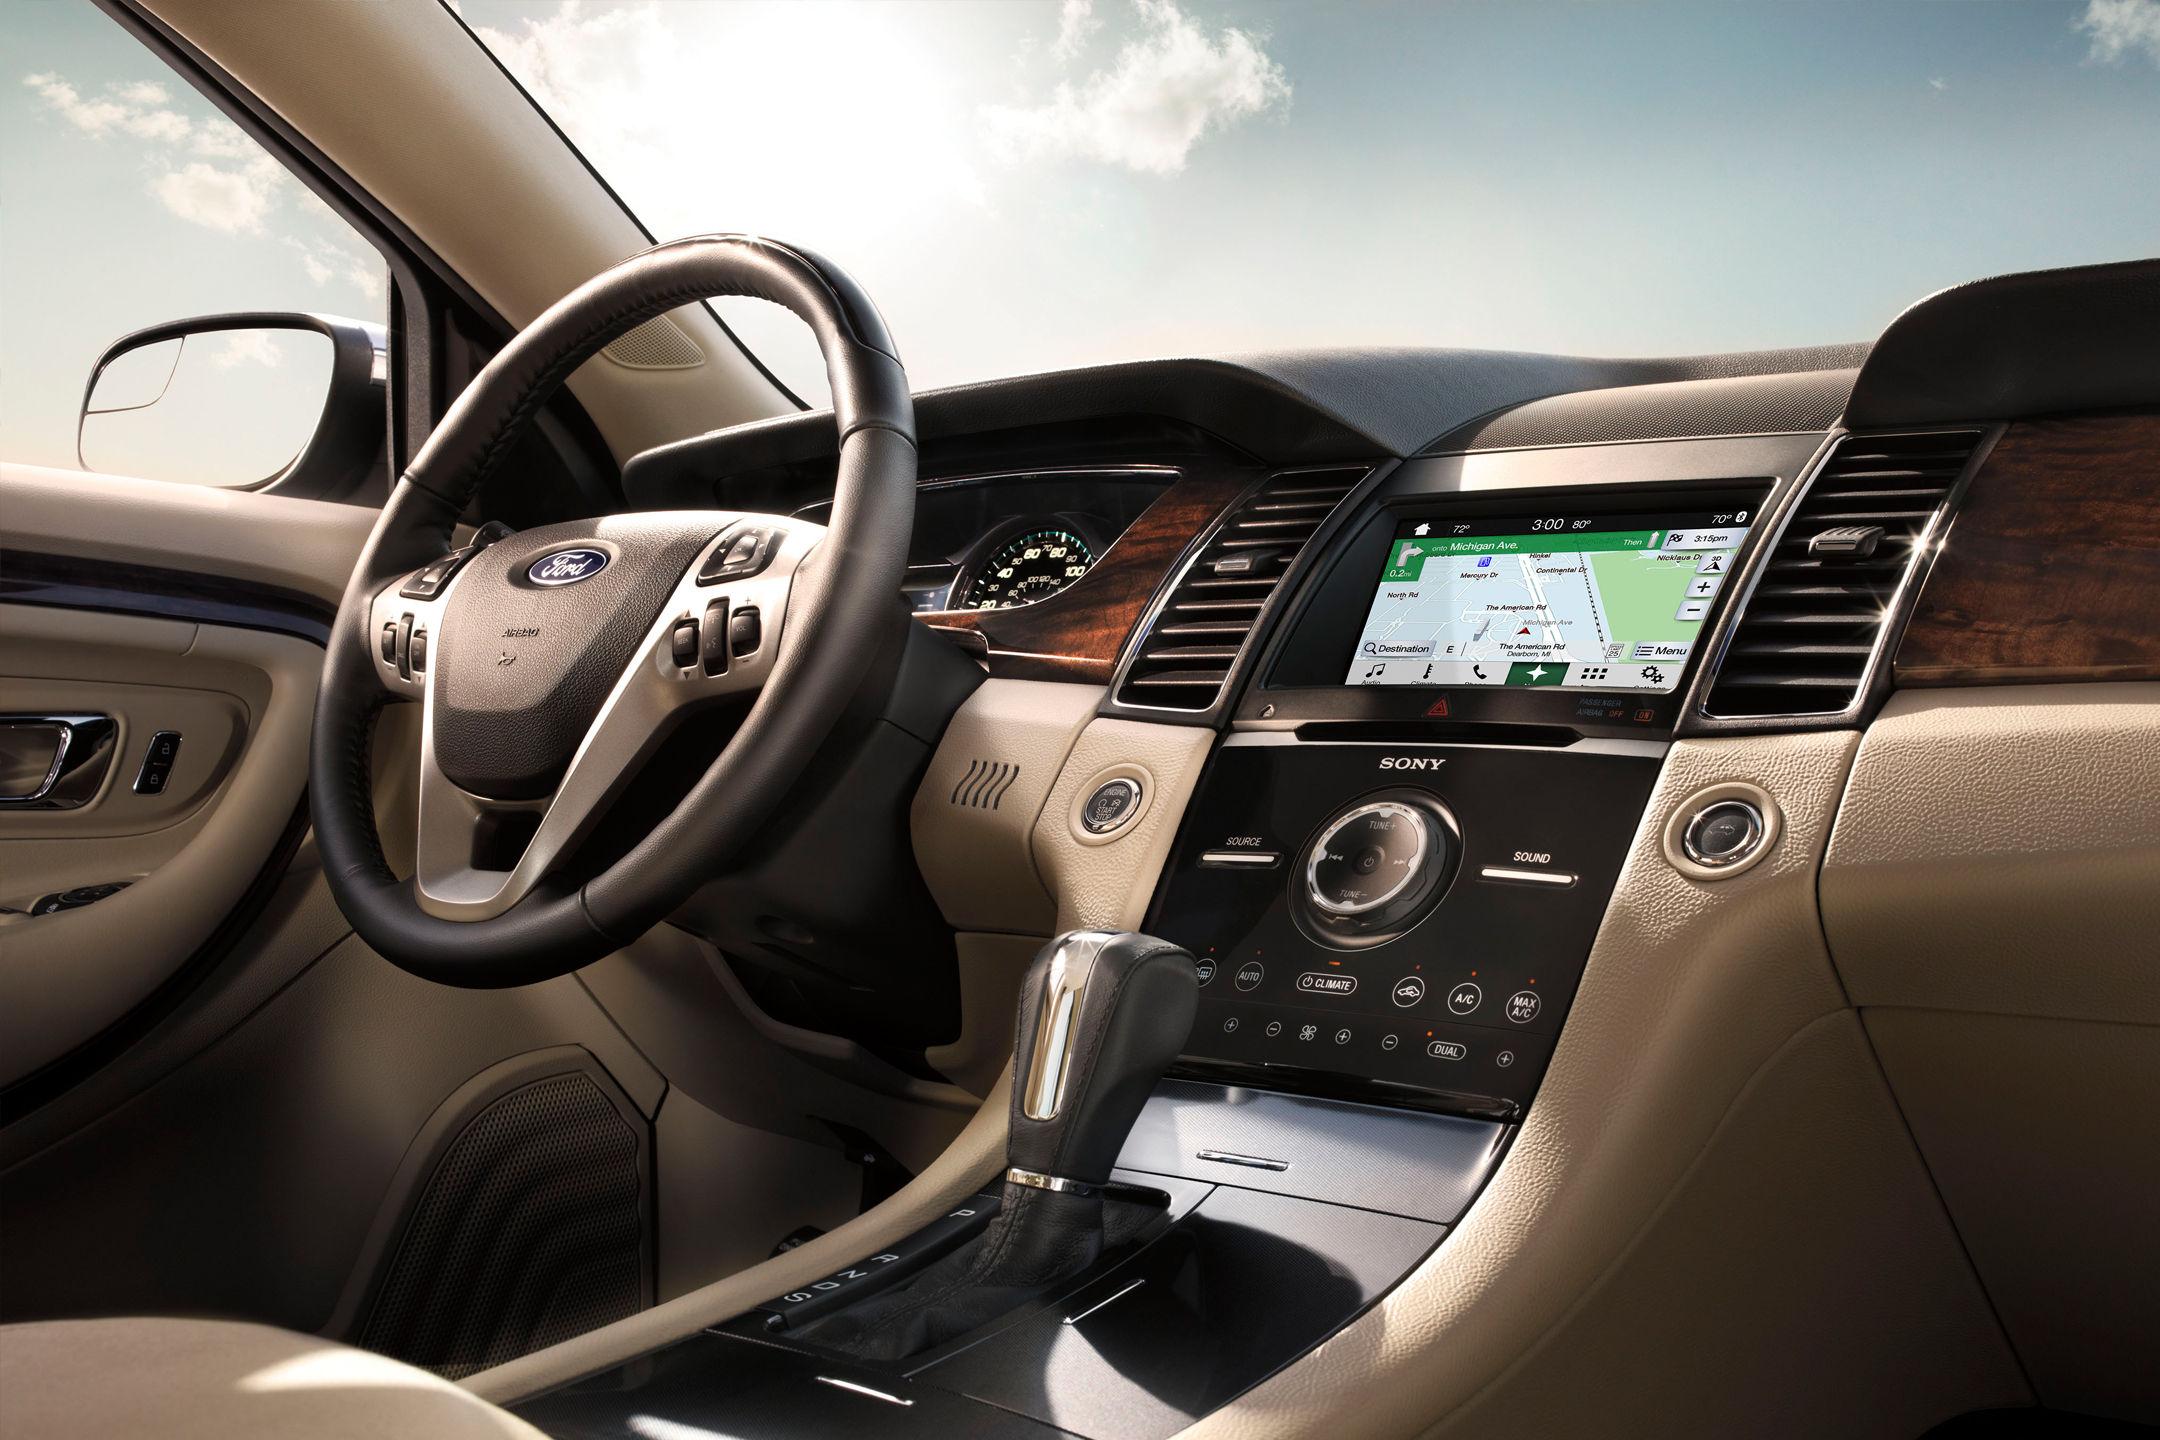 2017 Ford Taurus Two Tone Dashboard Interior